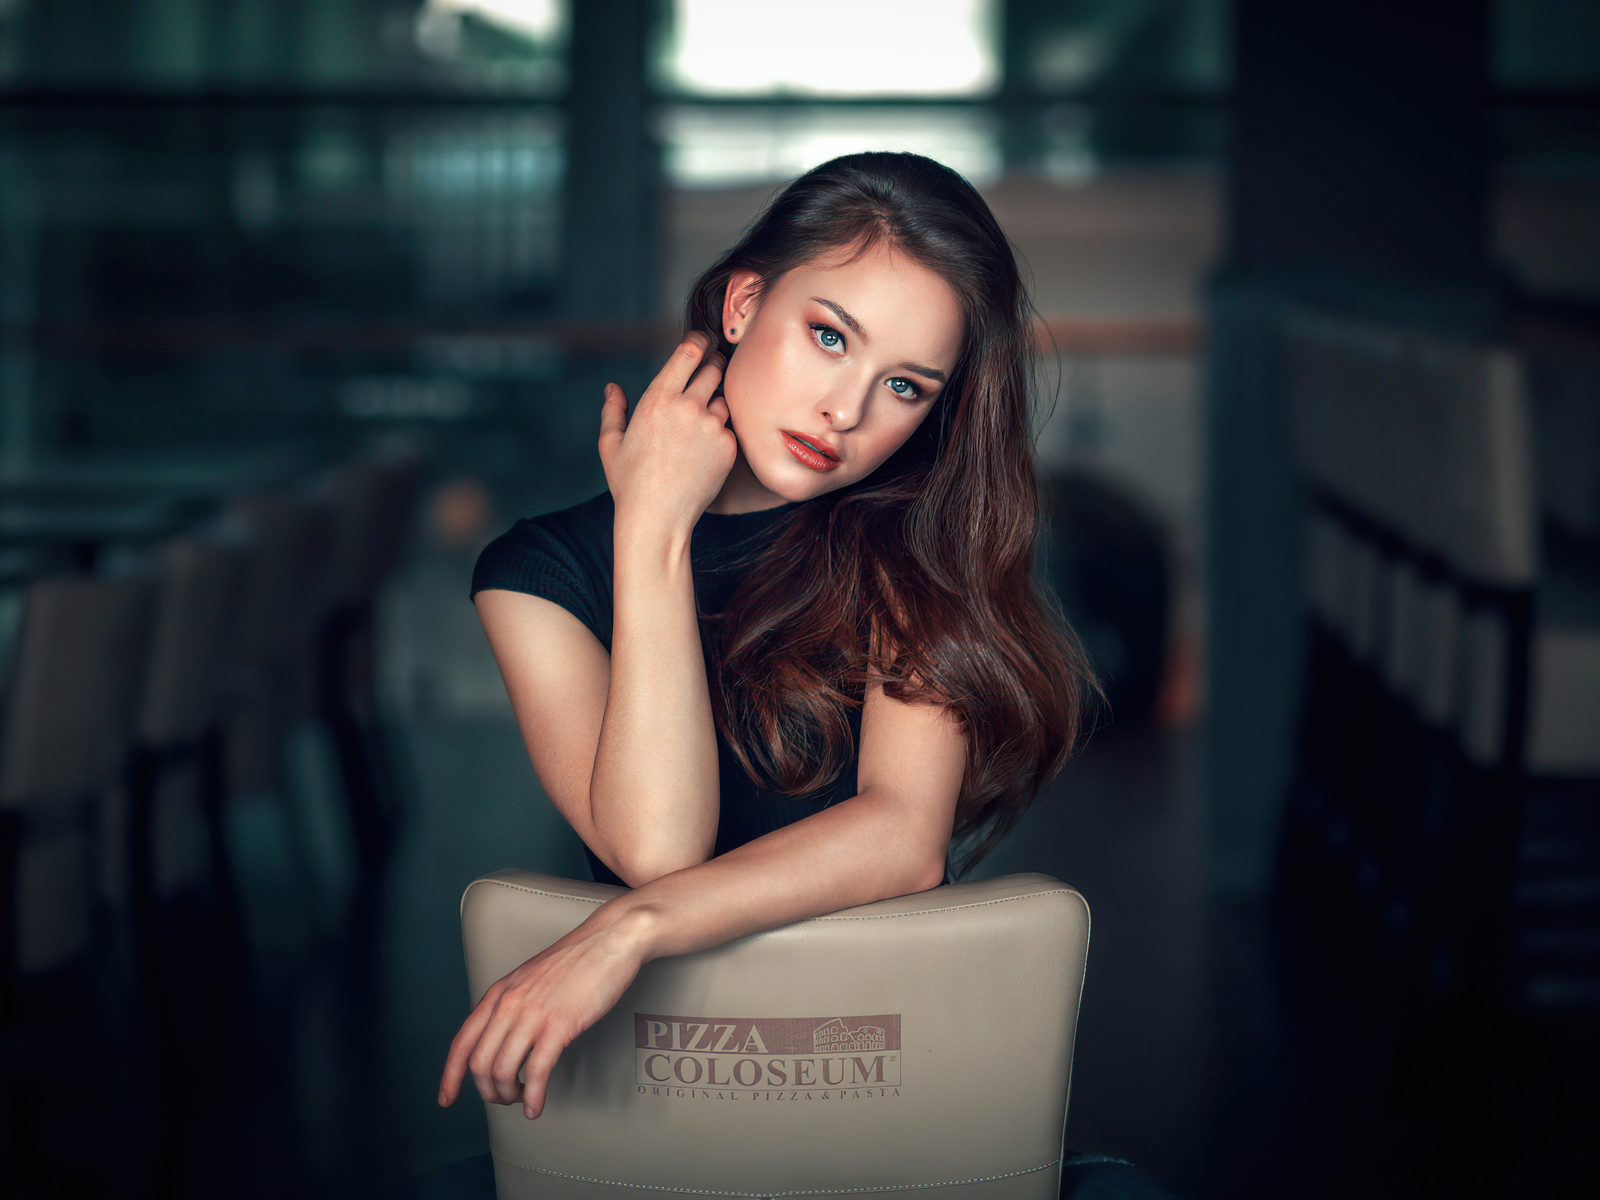 jiri tulach, девушка, портрет